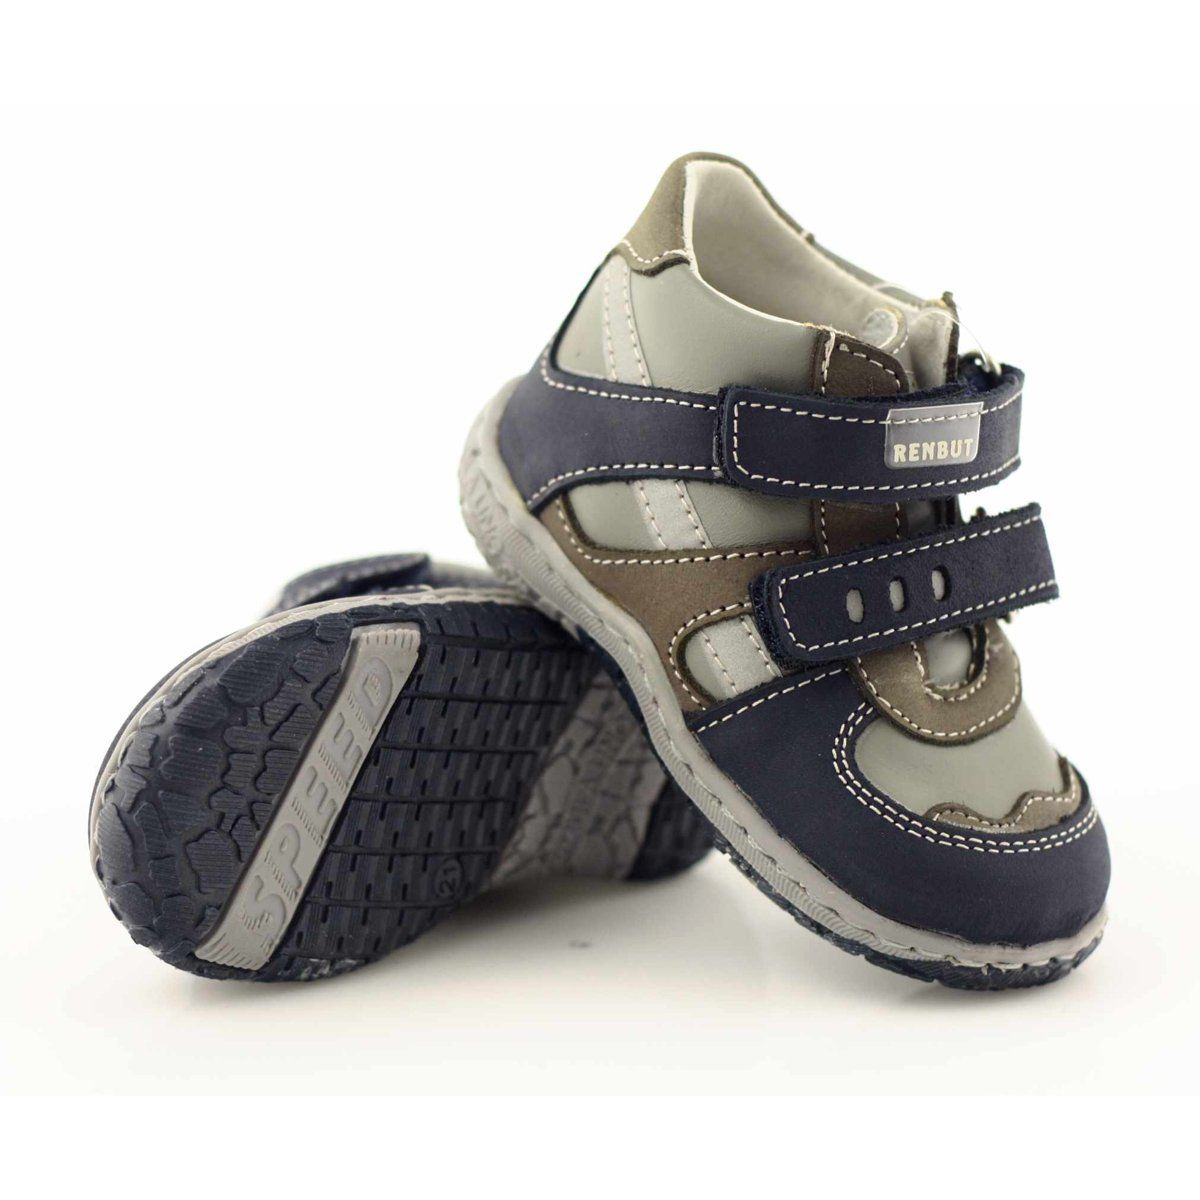 Trzewiki Chlopiece Ren But 1363 Granatowe Szare Fisherman Sandal Sandals Shoes